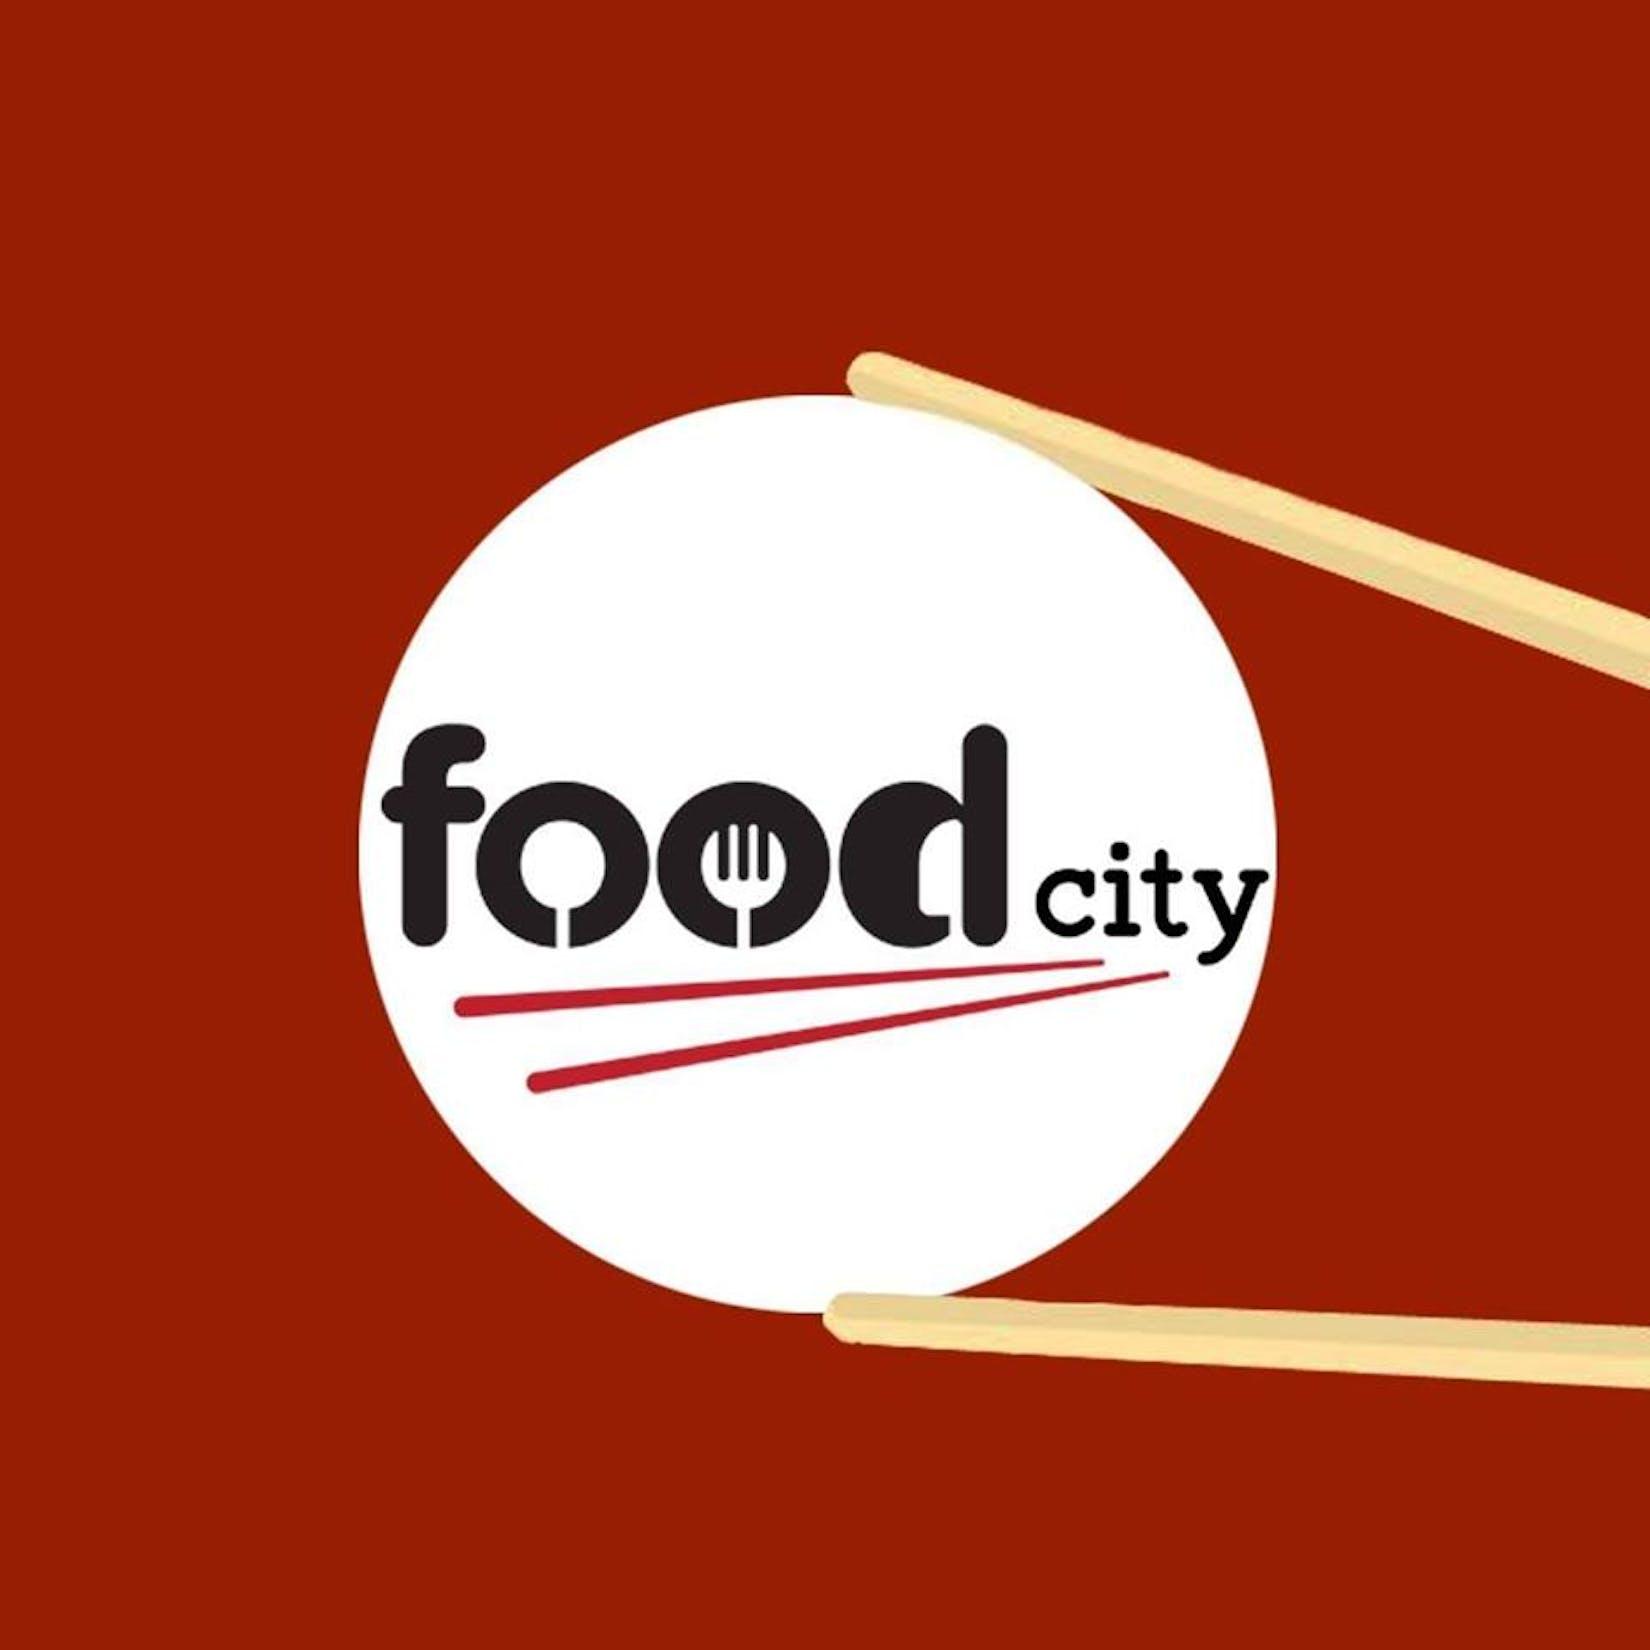 Food City @ Terminal 3 | yathar